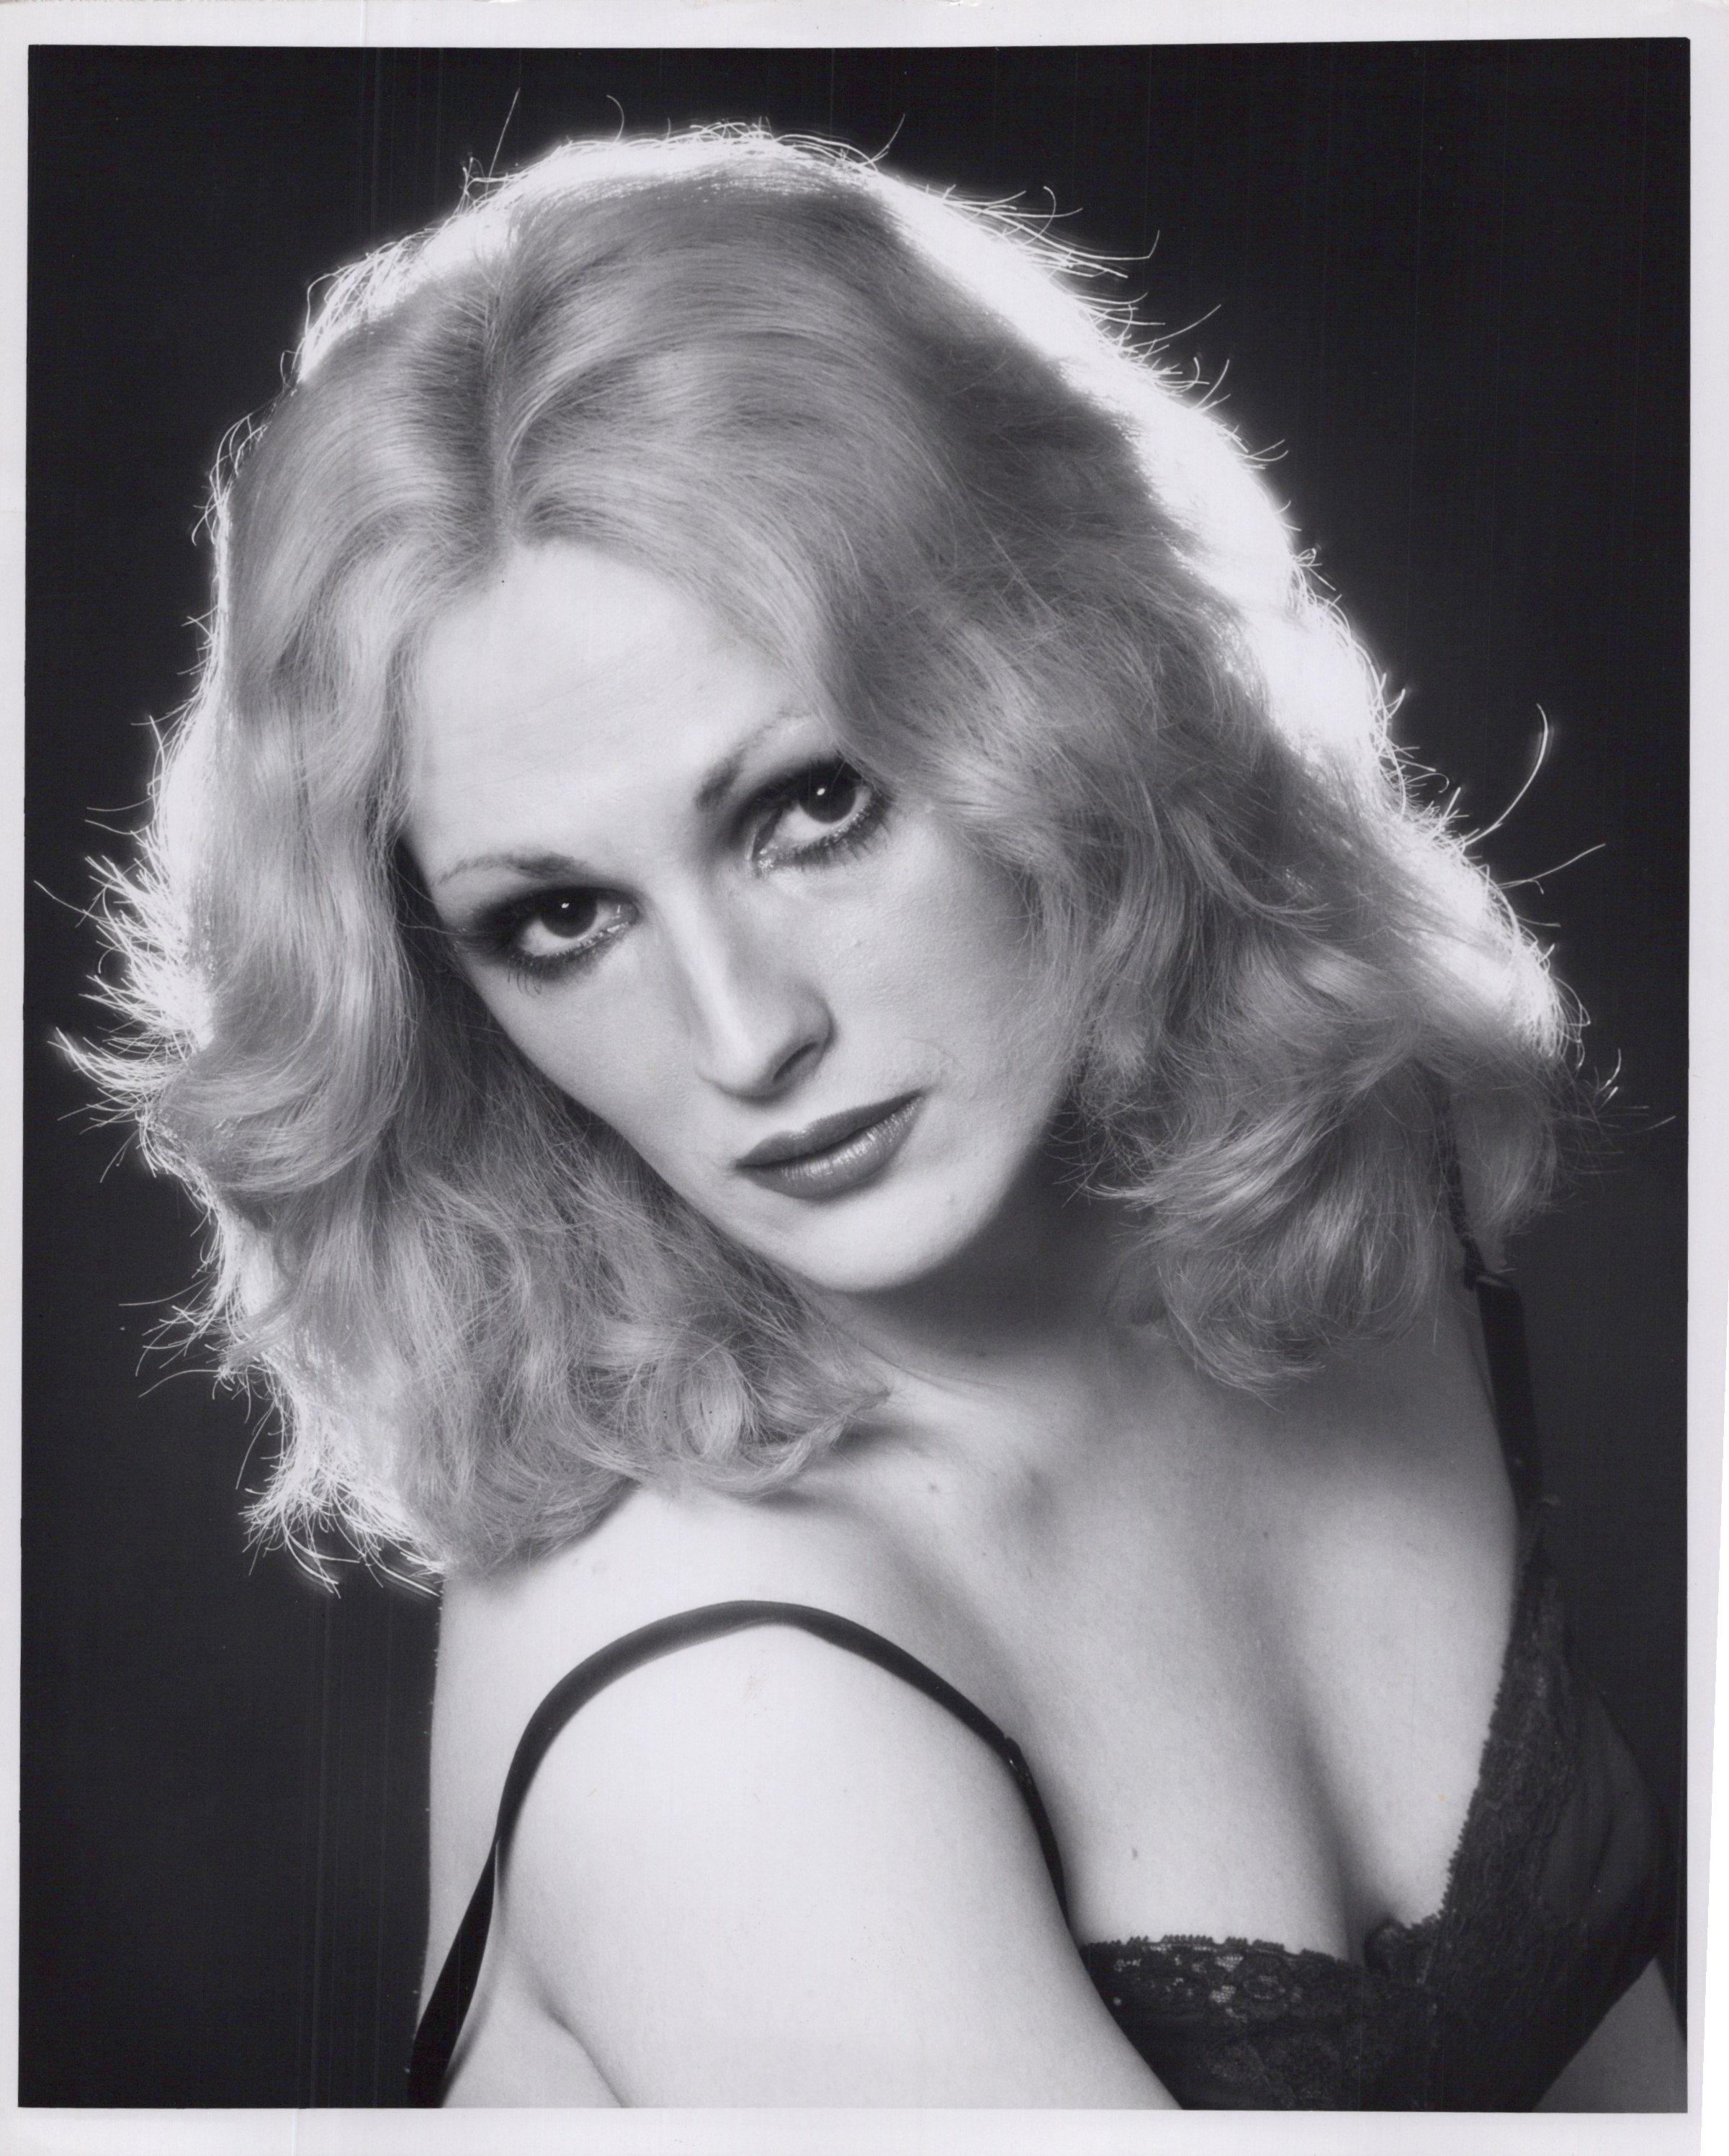 Andy Warhol Superstar Candy Darling Studio Portrait